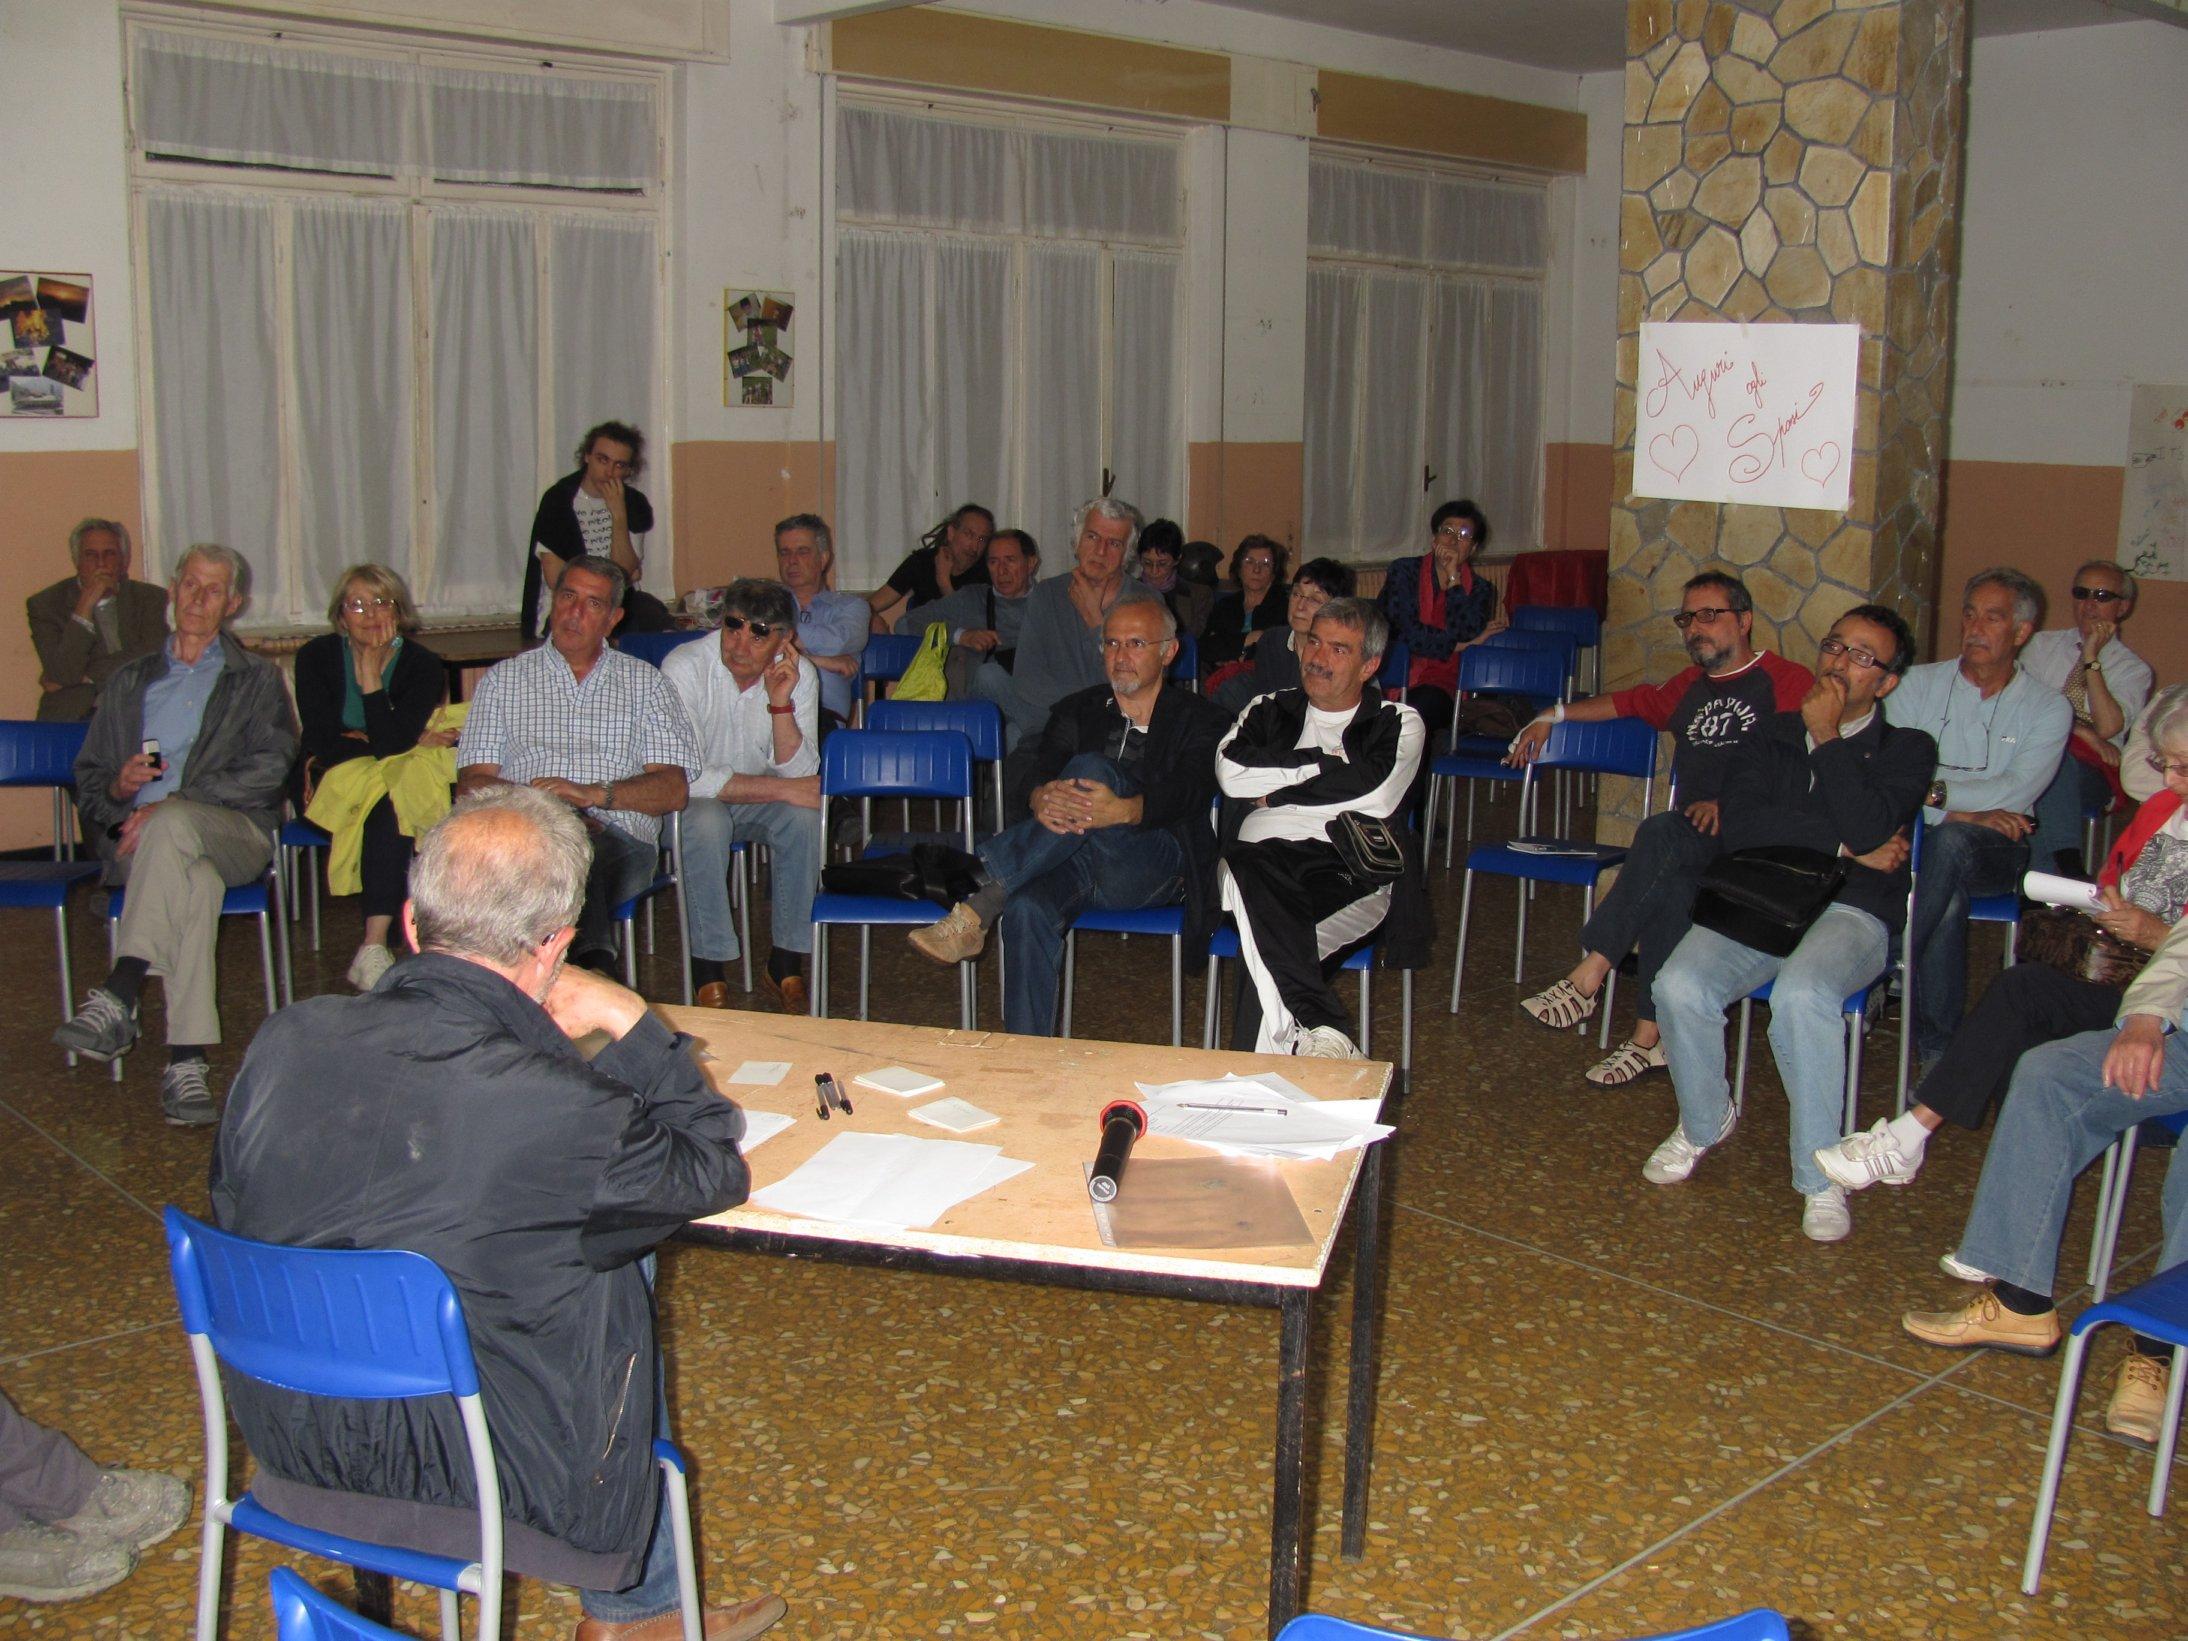 assemblea_gavoglio_2013-06-05-19-43-51